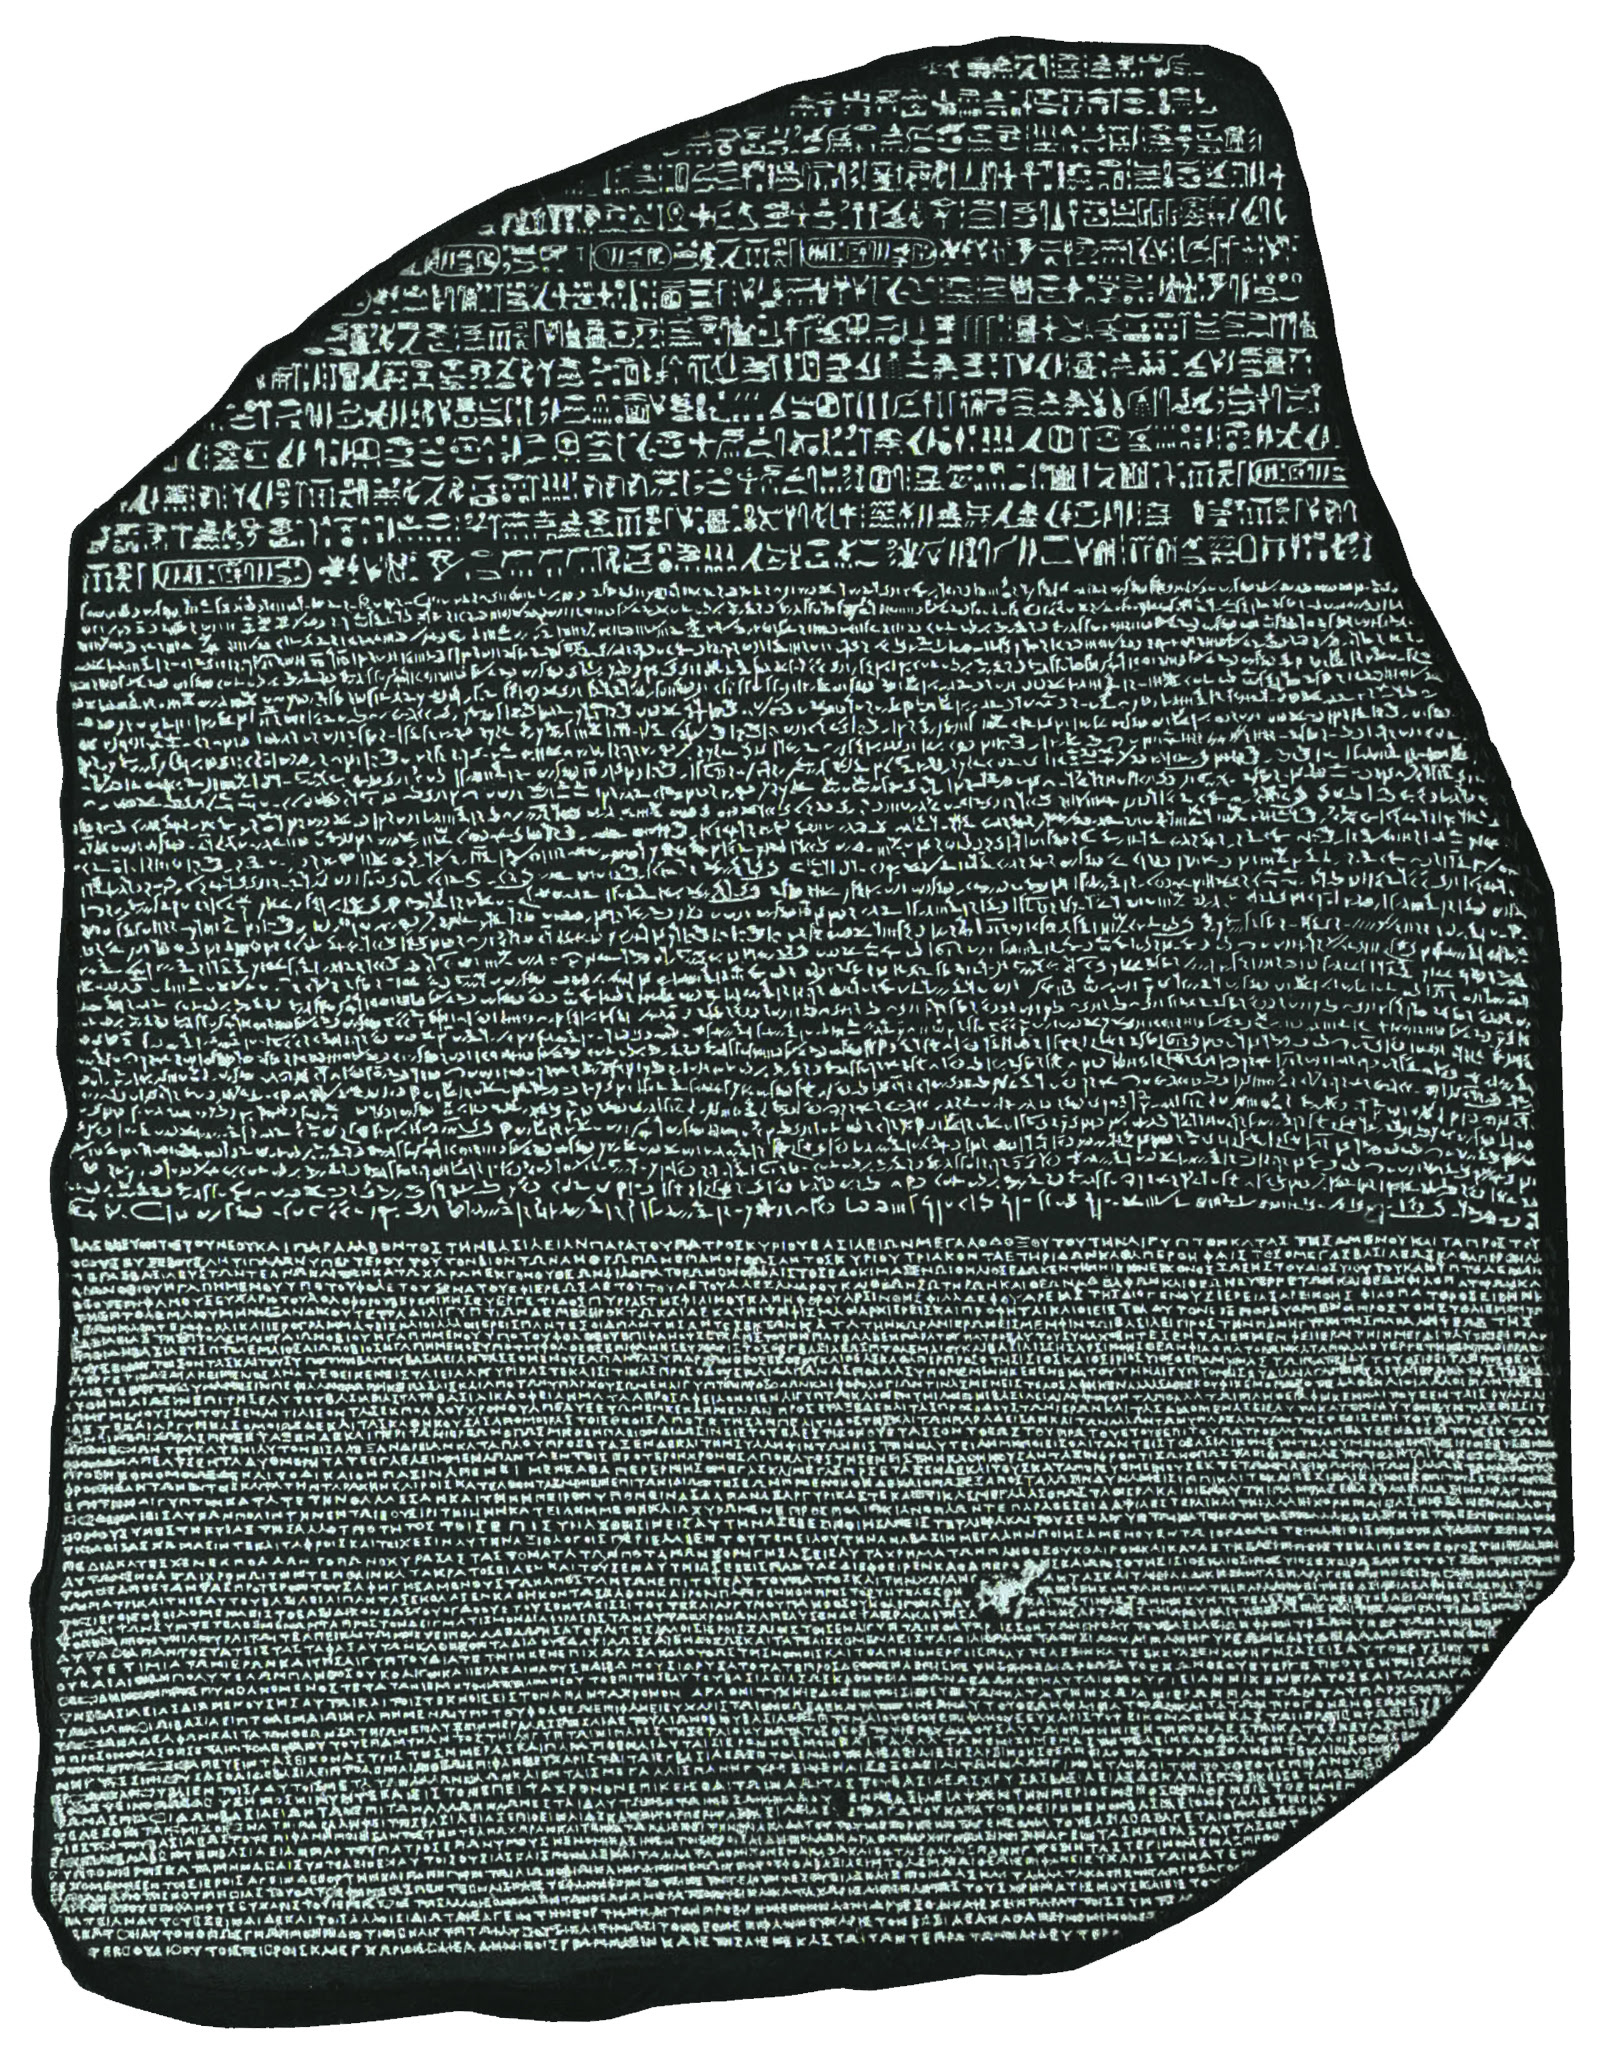 http://upload.wikimedia.org/wikipedia/commons/c/ca/Rosetta_Stone_BW.jpeg